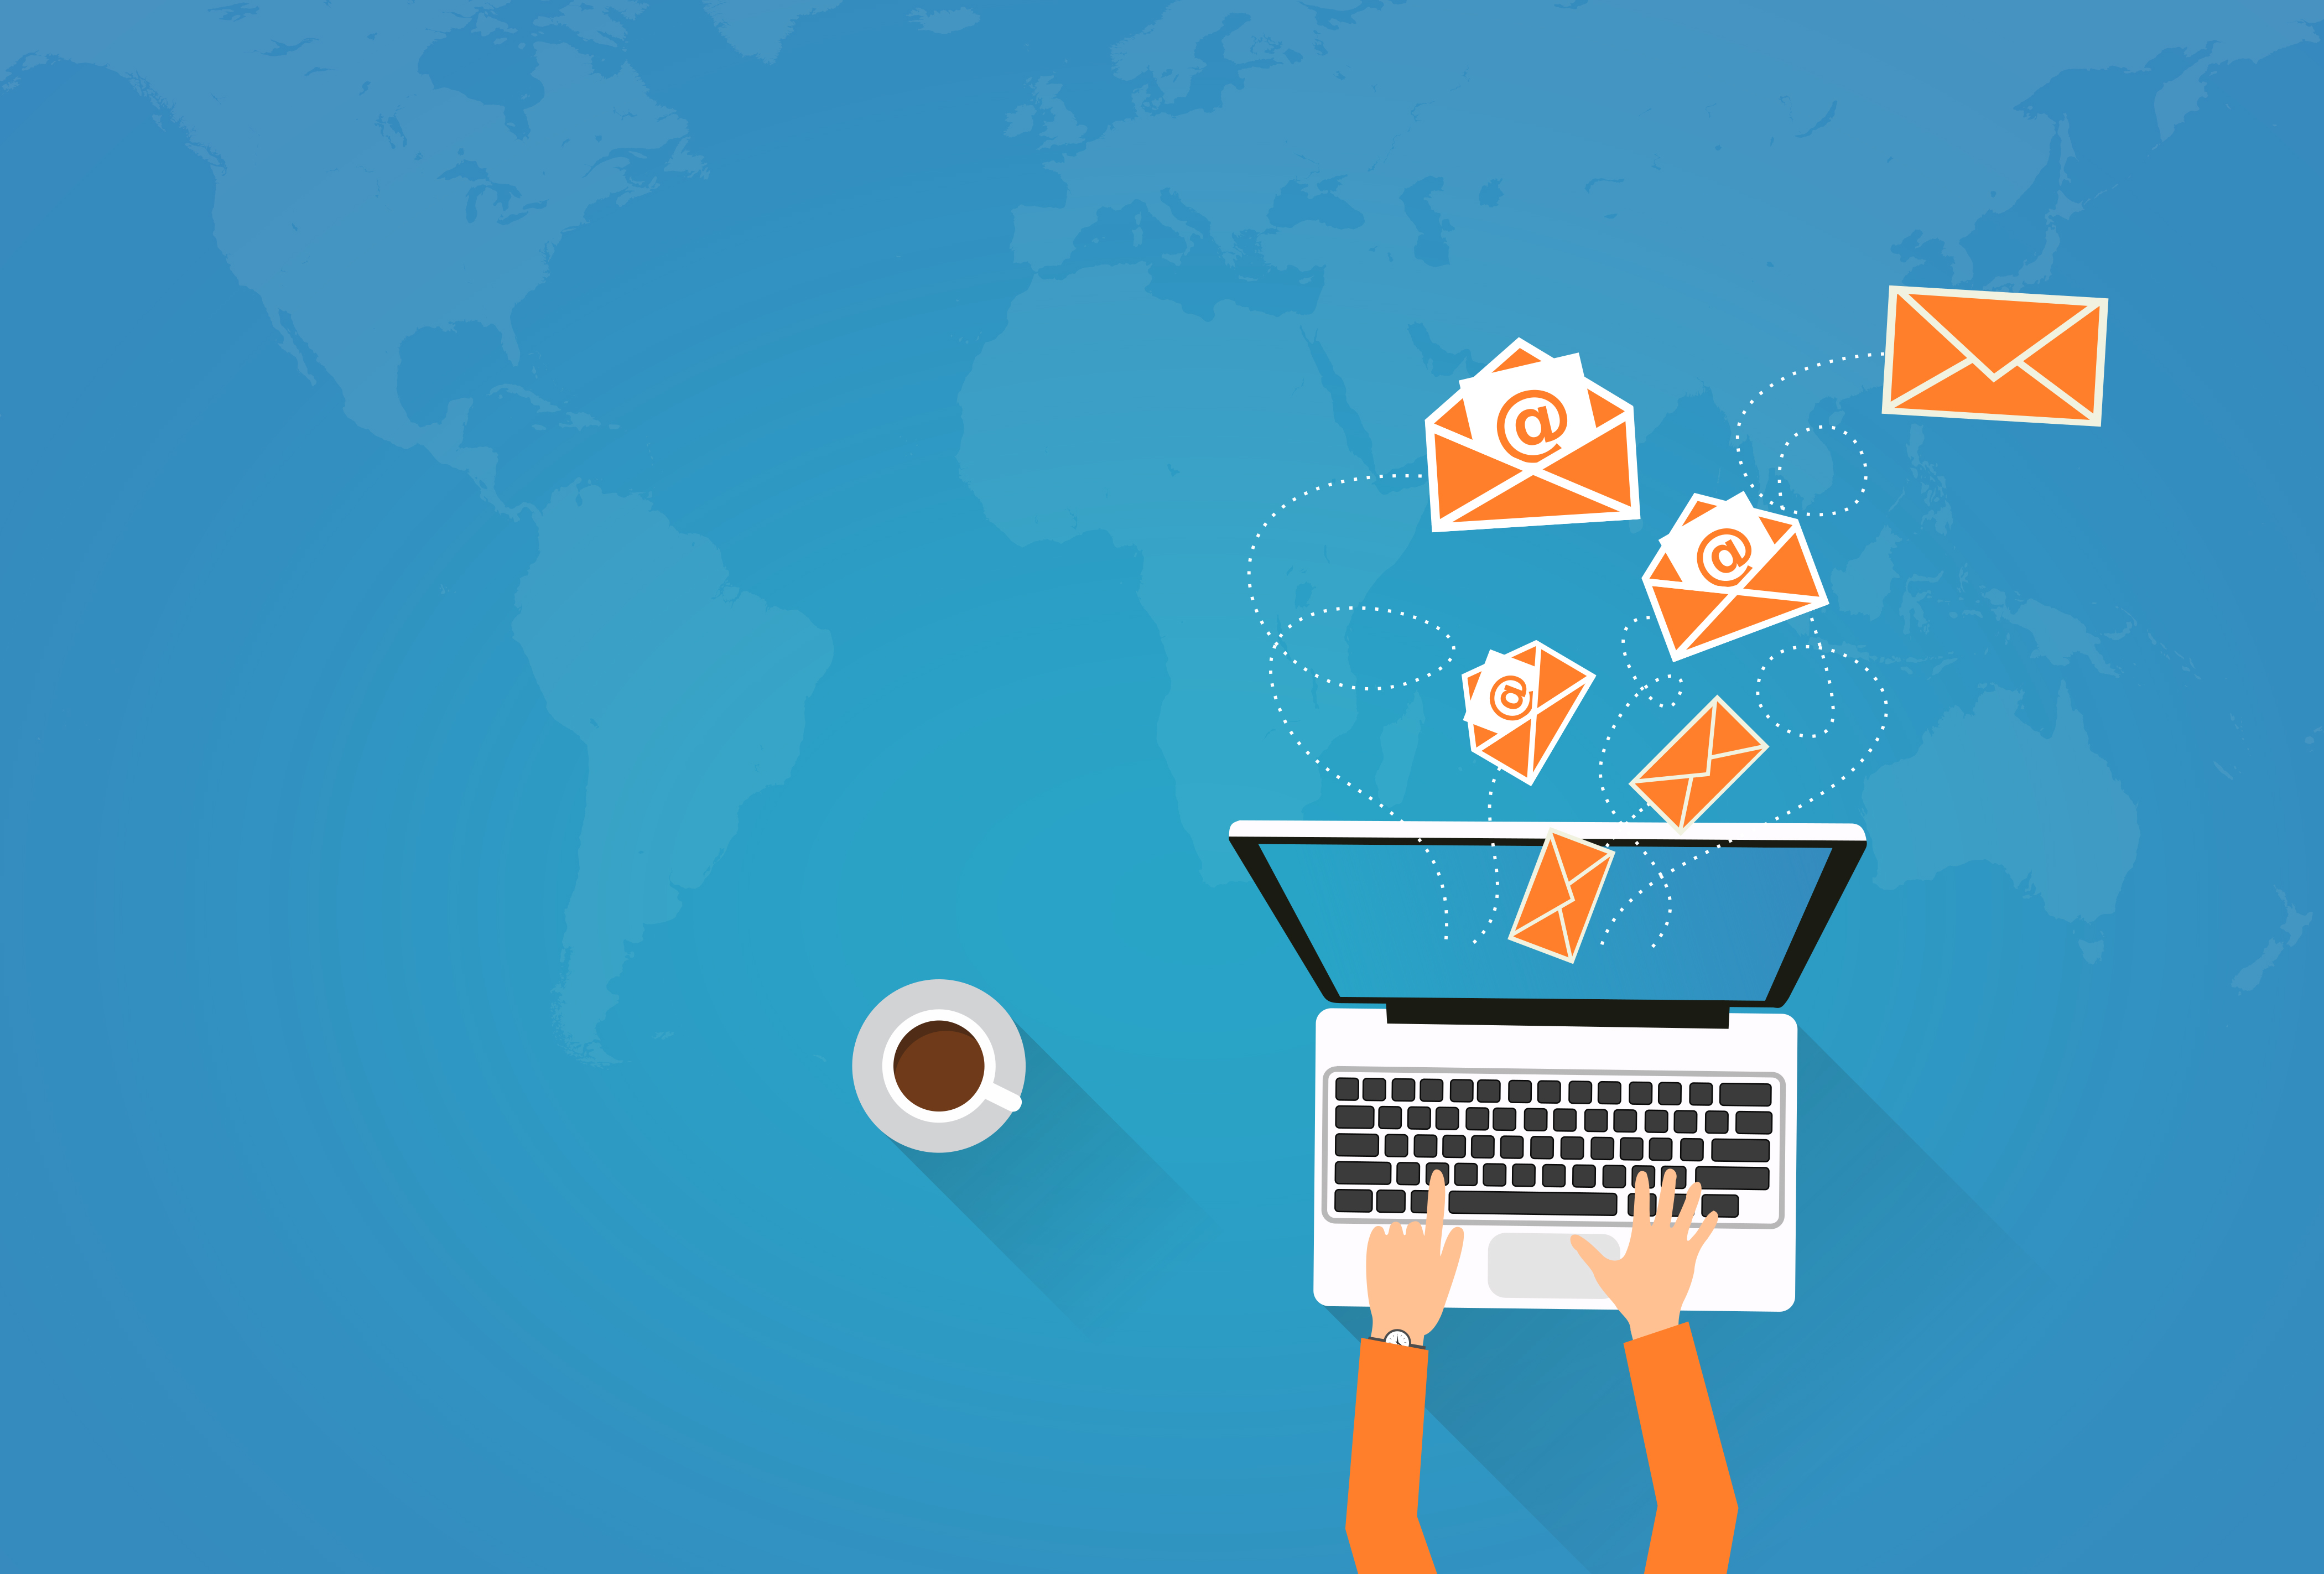 Person on Laptop Sending Virtual Envelopes, Advertisement, Message, New, Network, HQ Photo